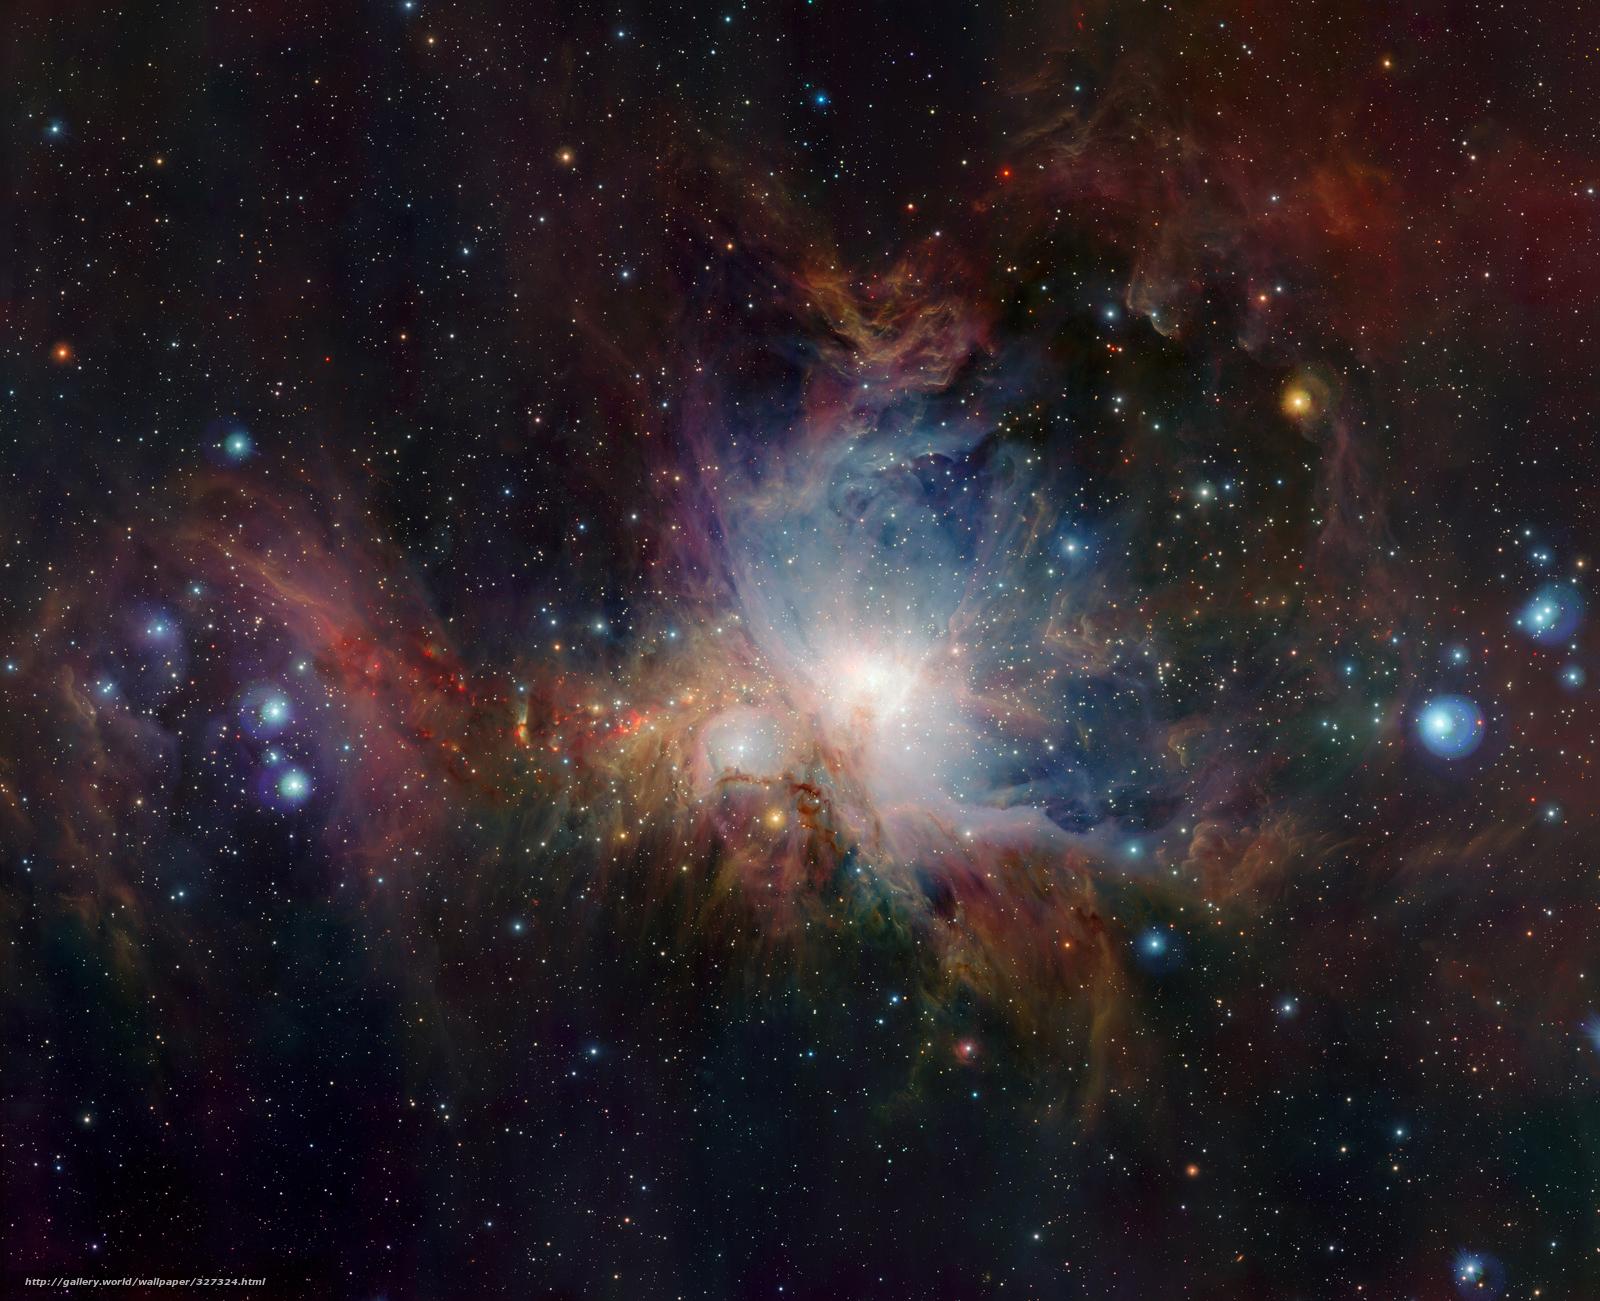 wallpaper nebula Orion constellation Star desktop wallpaper 1600x1301